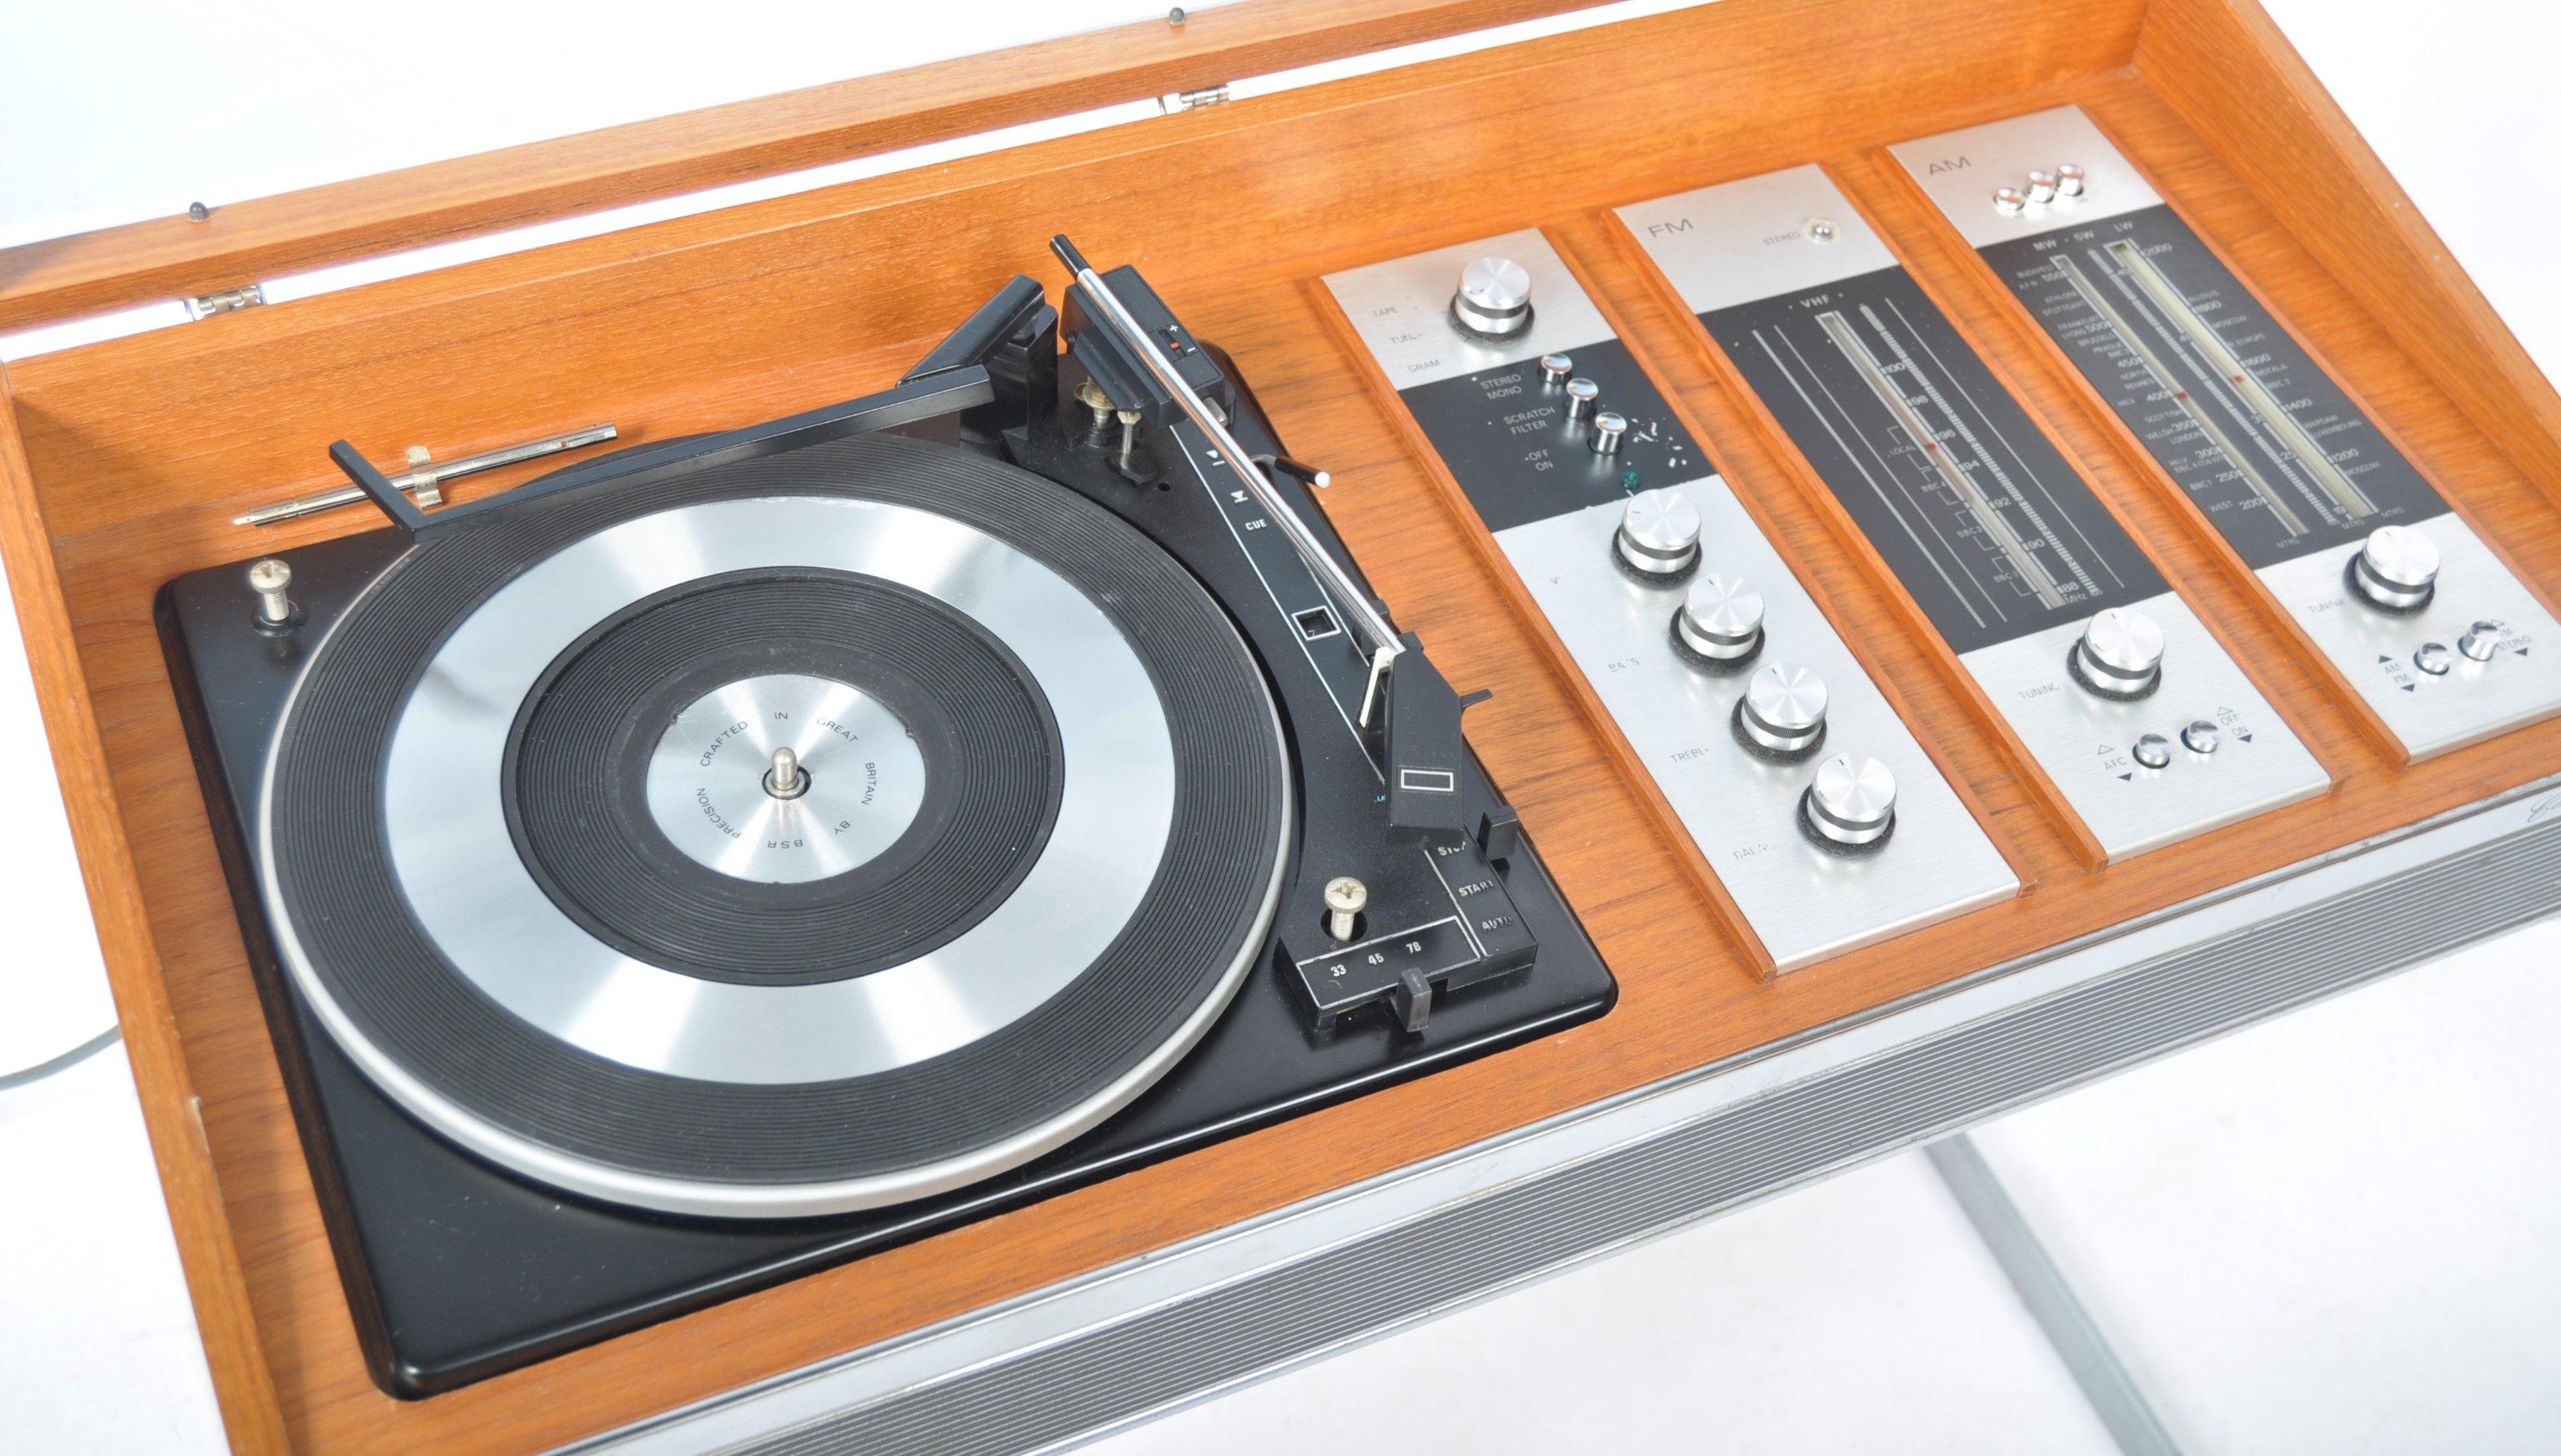 STUNNING DECCA SOUND TEAK CASED AUDIO SYSTEM RAISED ON CHROME SUPPORTS - Image 3 of 8